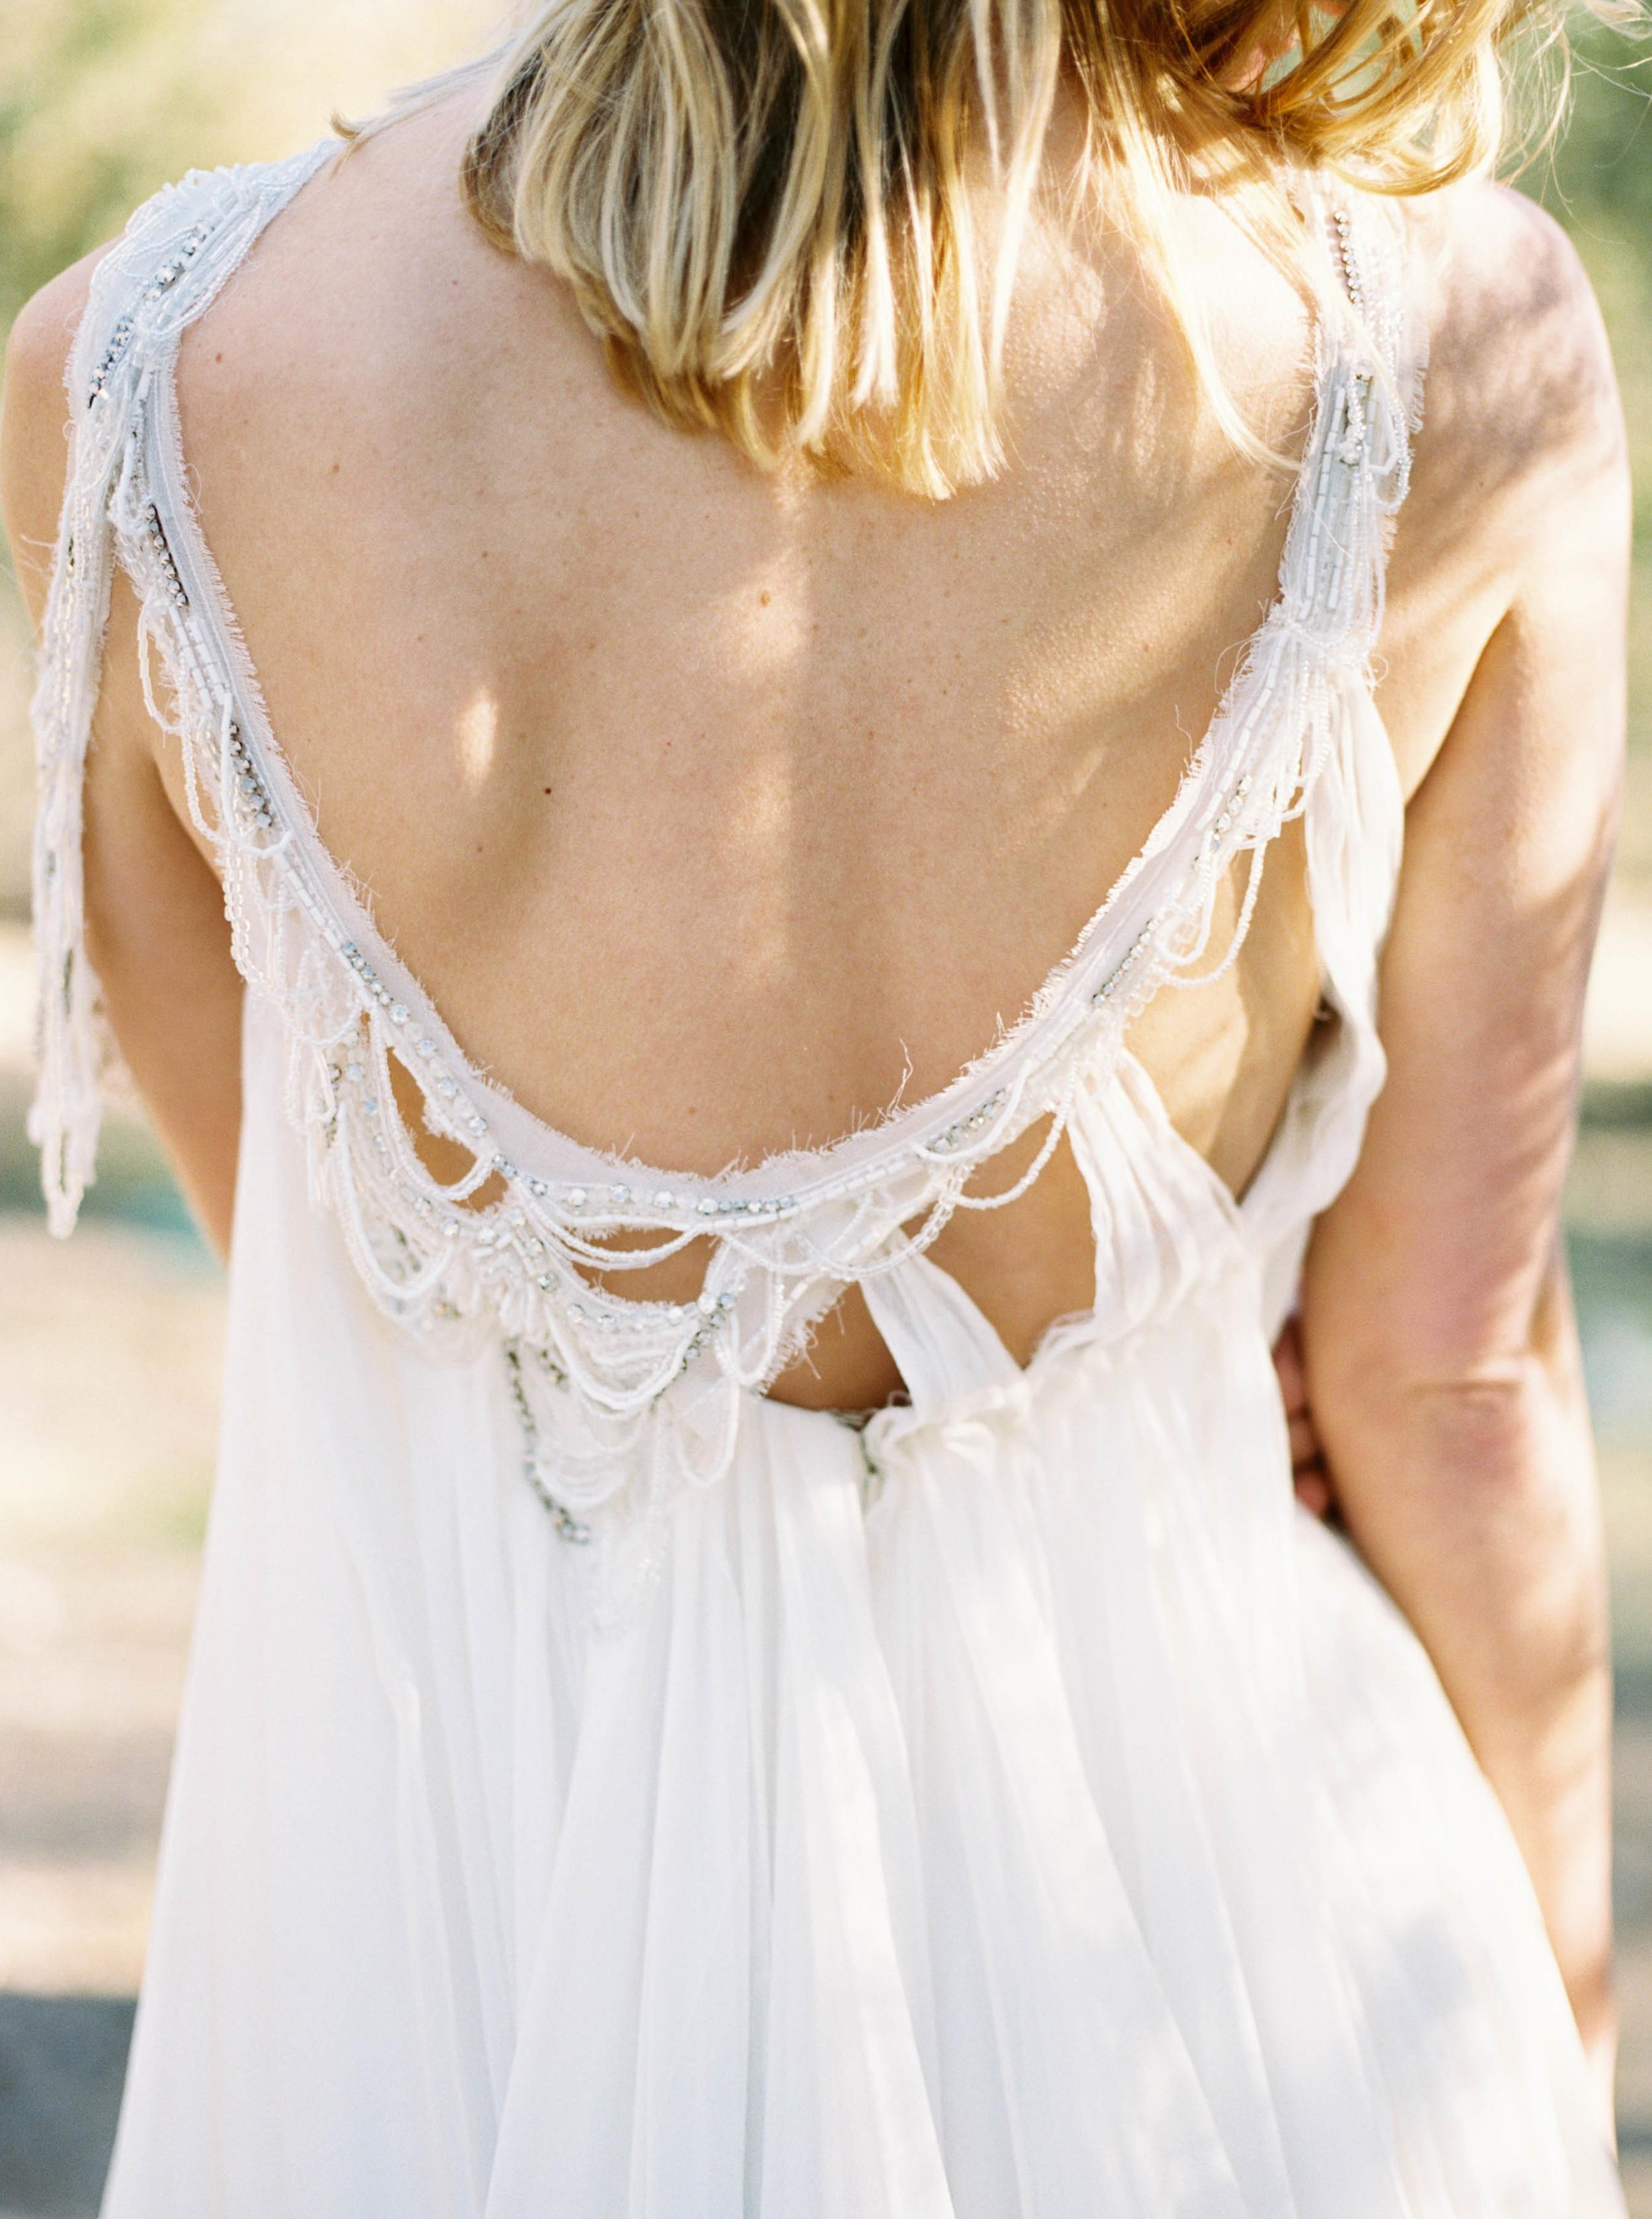 Danford-Photography-Bozeman-Montana-Arizona-Fine Art Film-Wedding-Engagement-Photographers-32.jpg